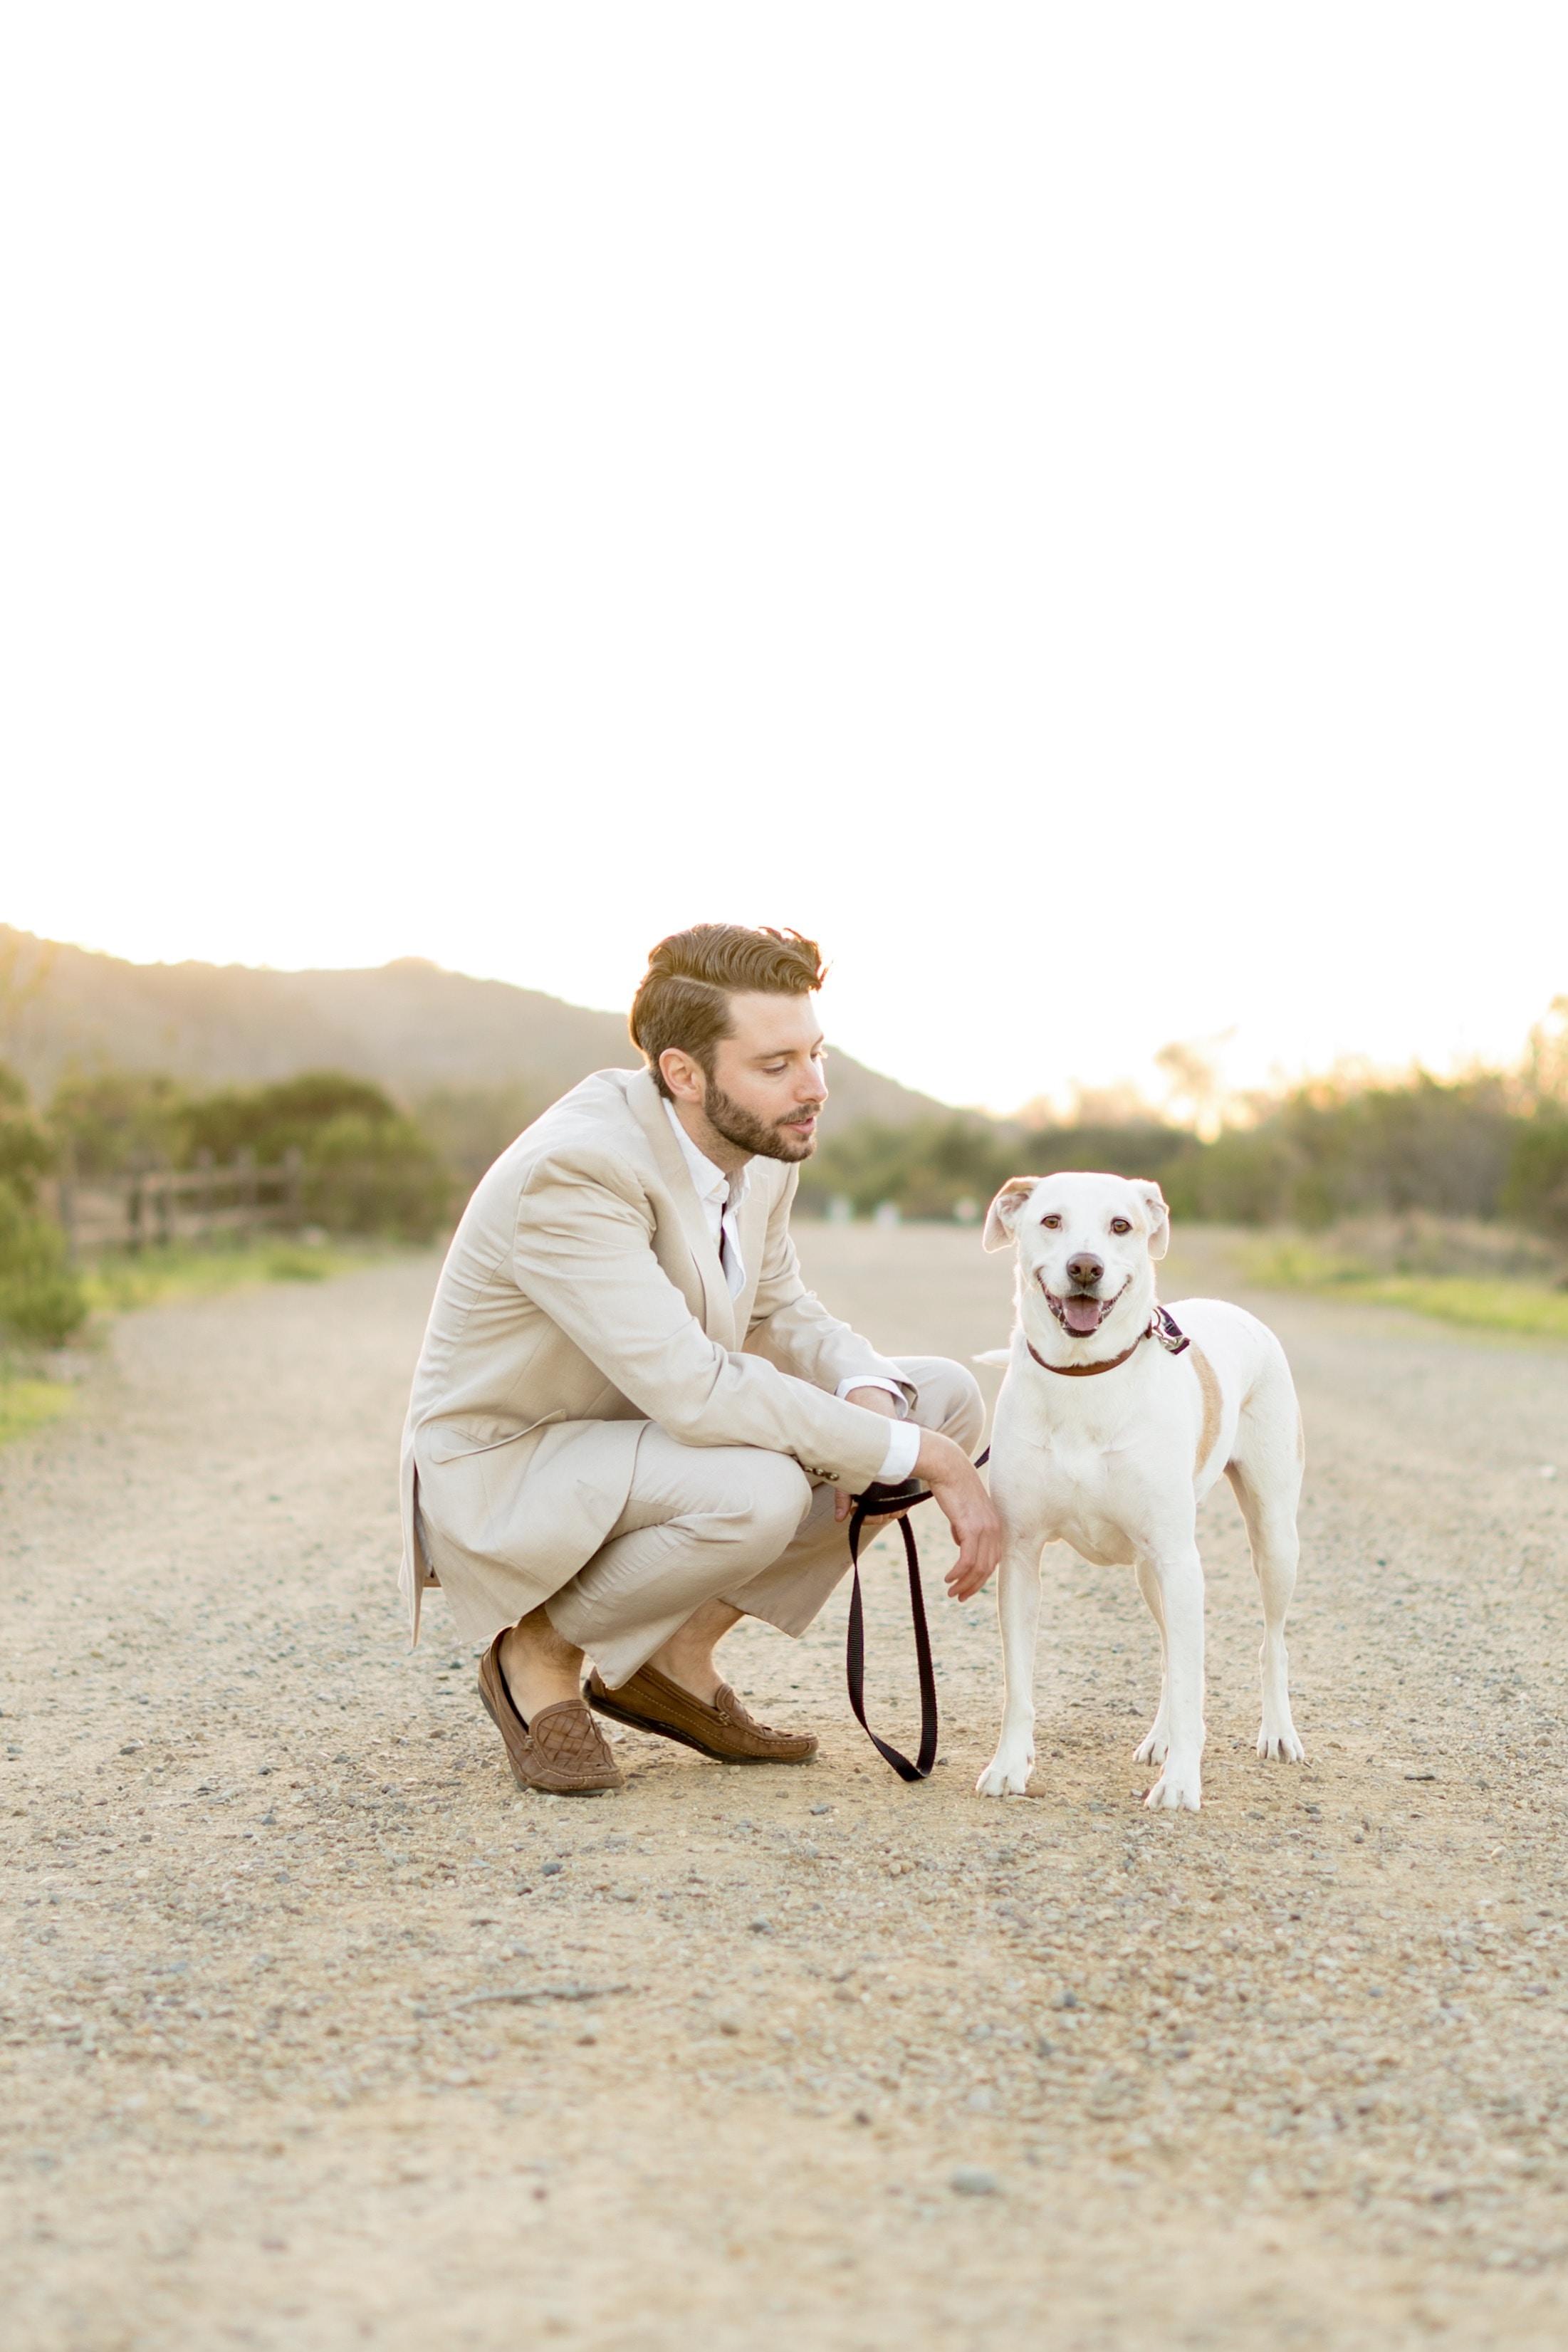 man sitting beside dog at dirt road